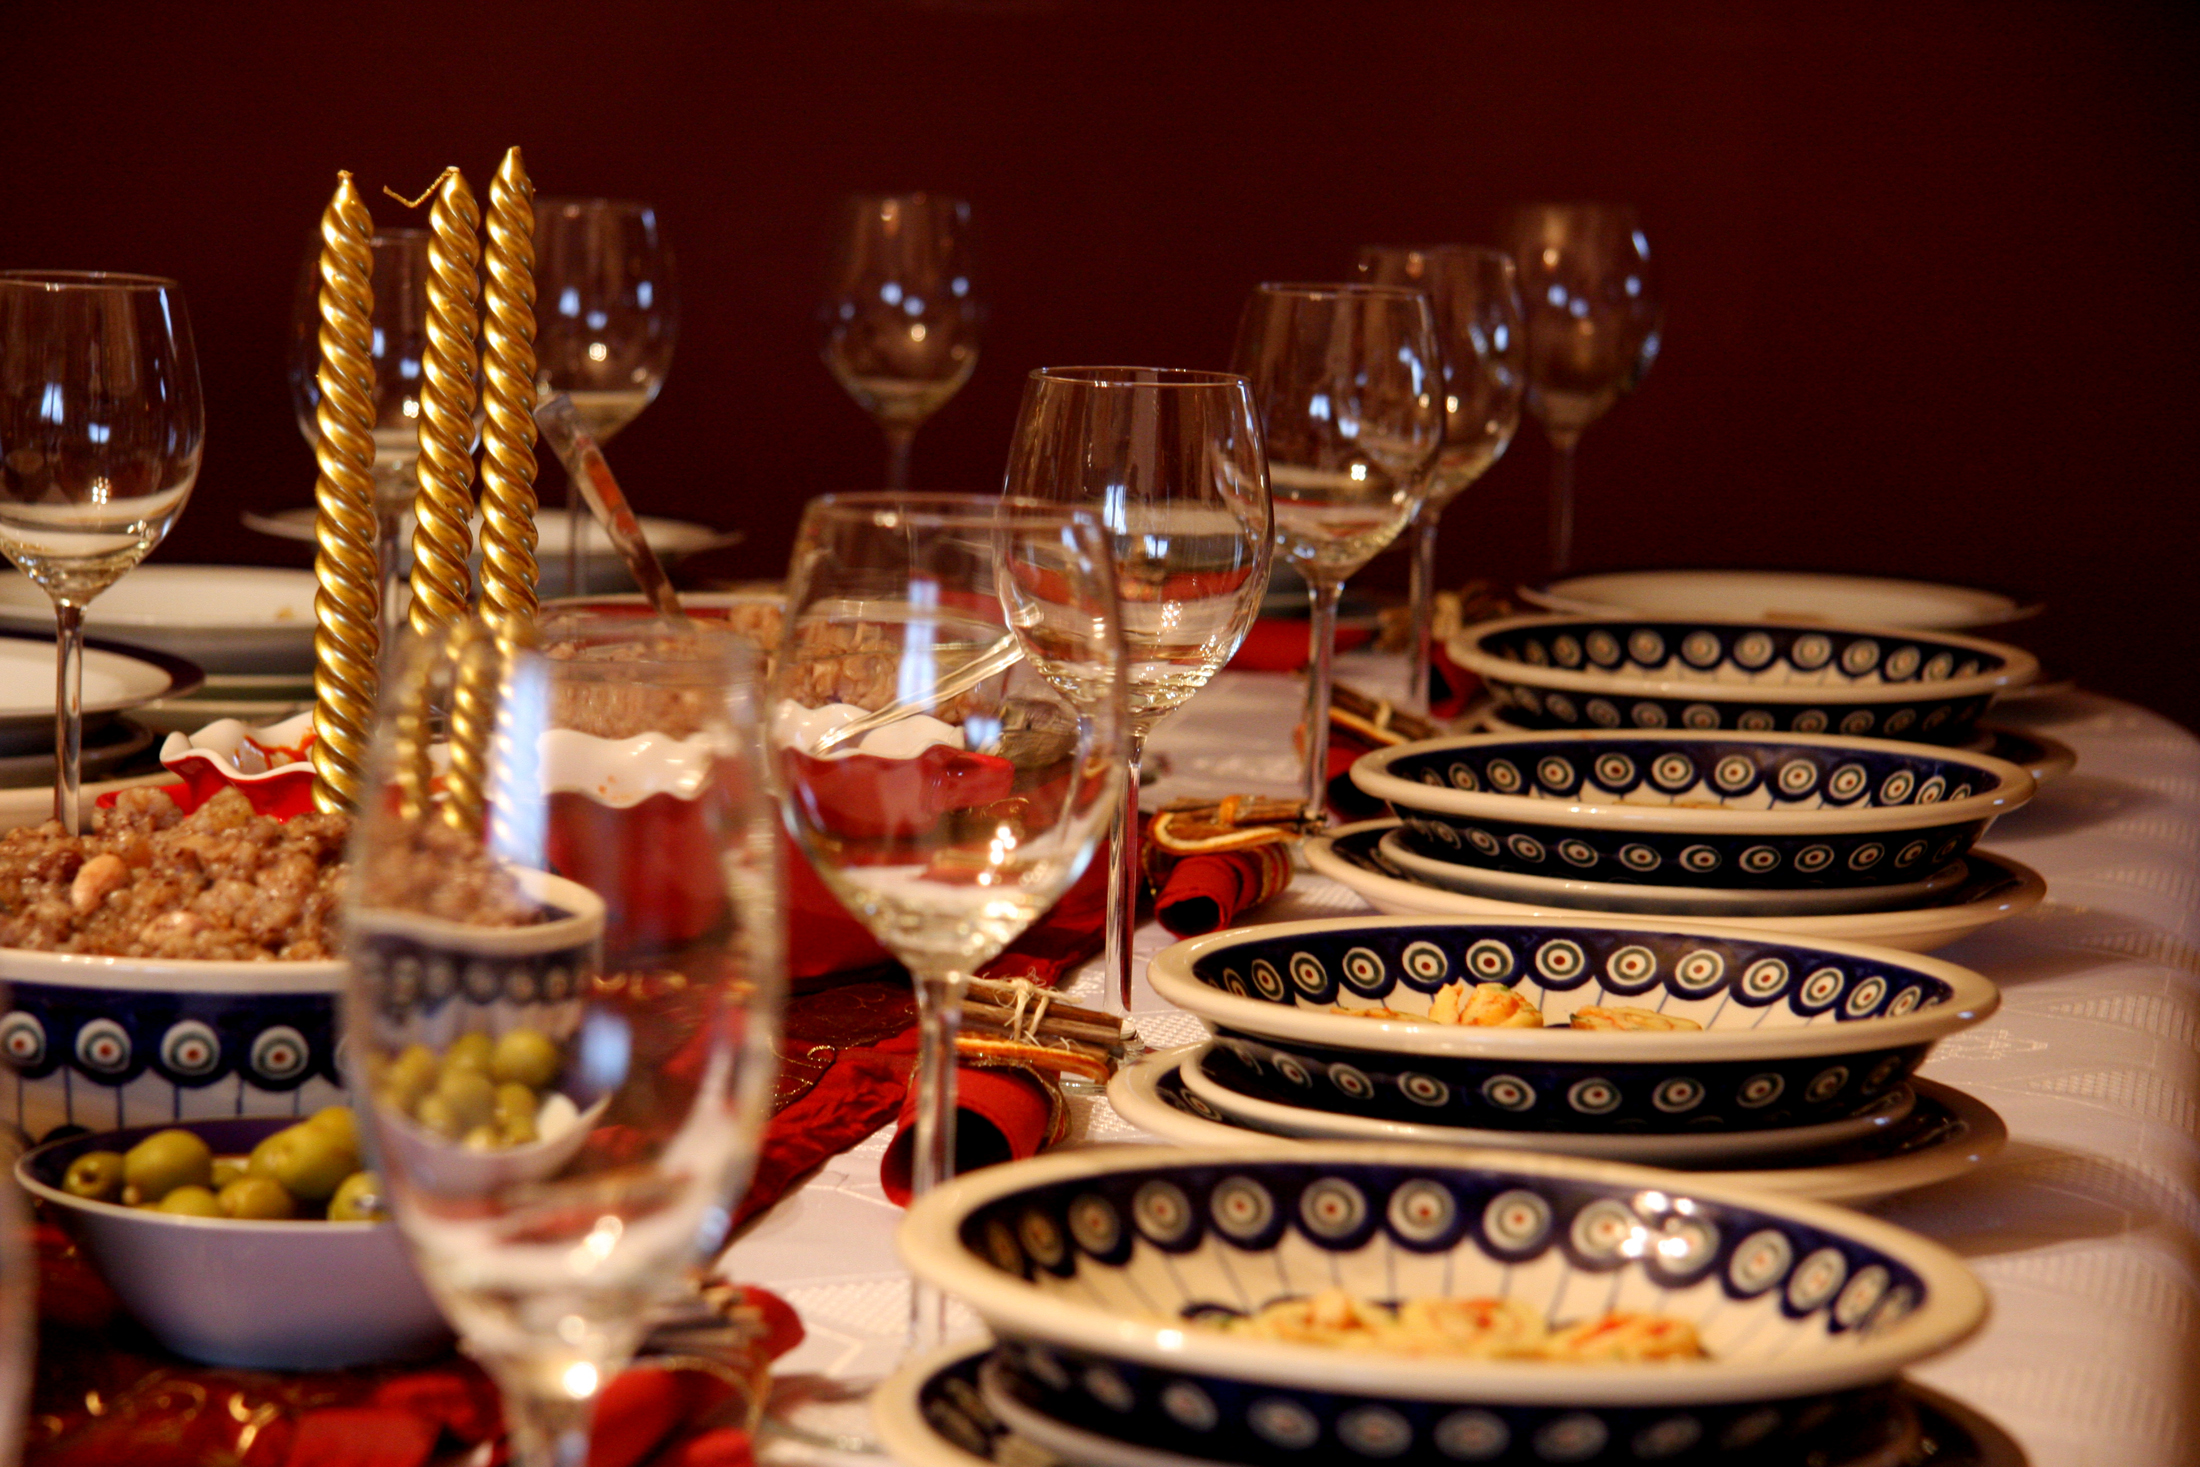 festive dinner table layout